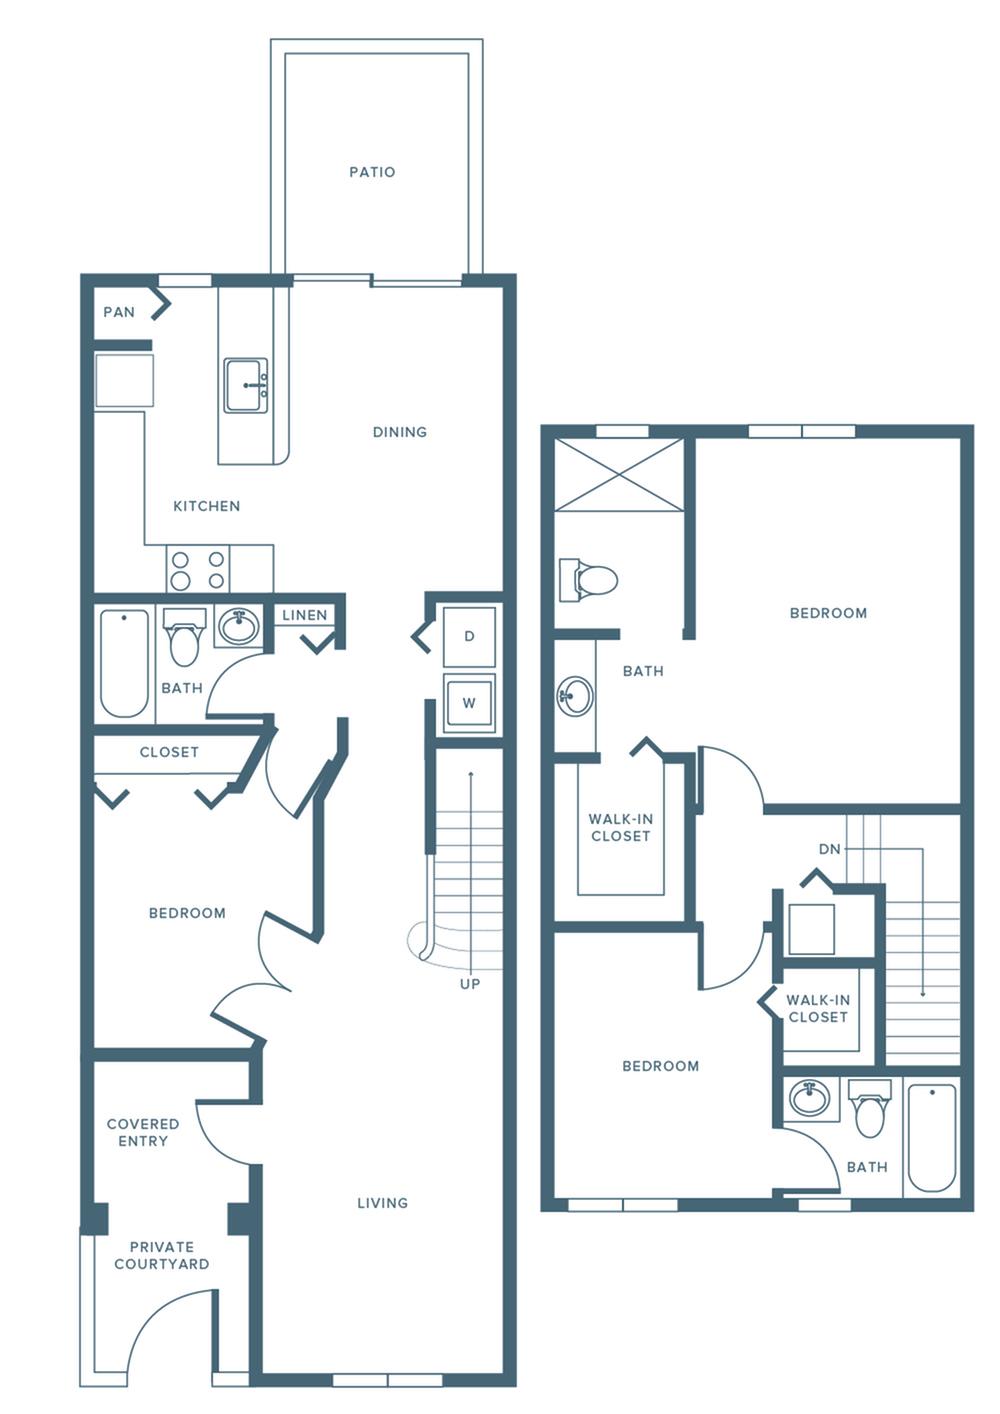 1379 square foot renovated three bedroom three bath two level apartment floorplan image